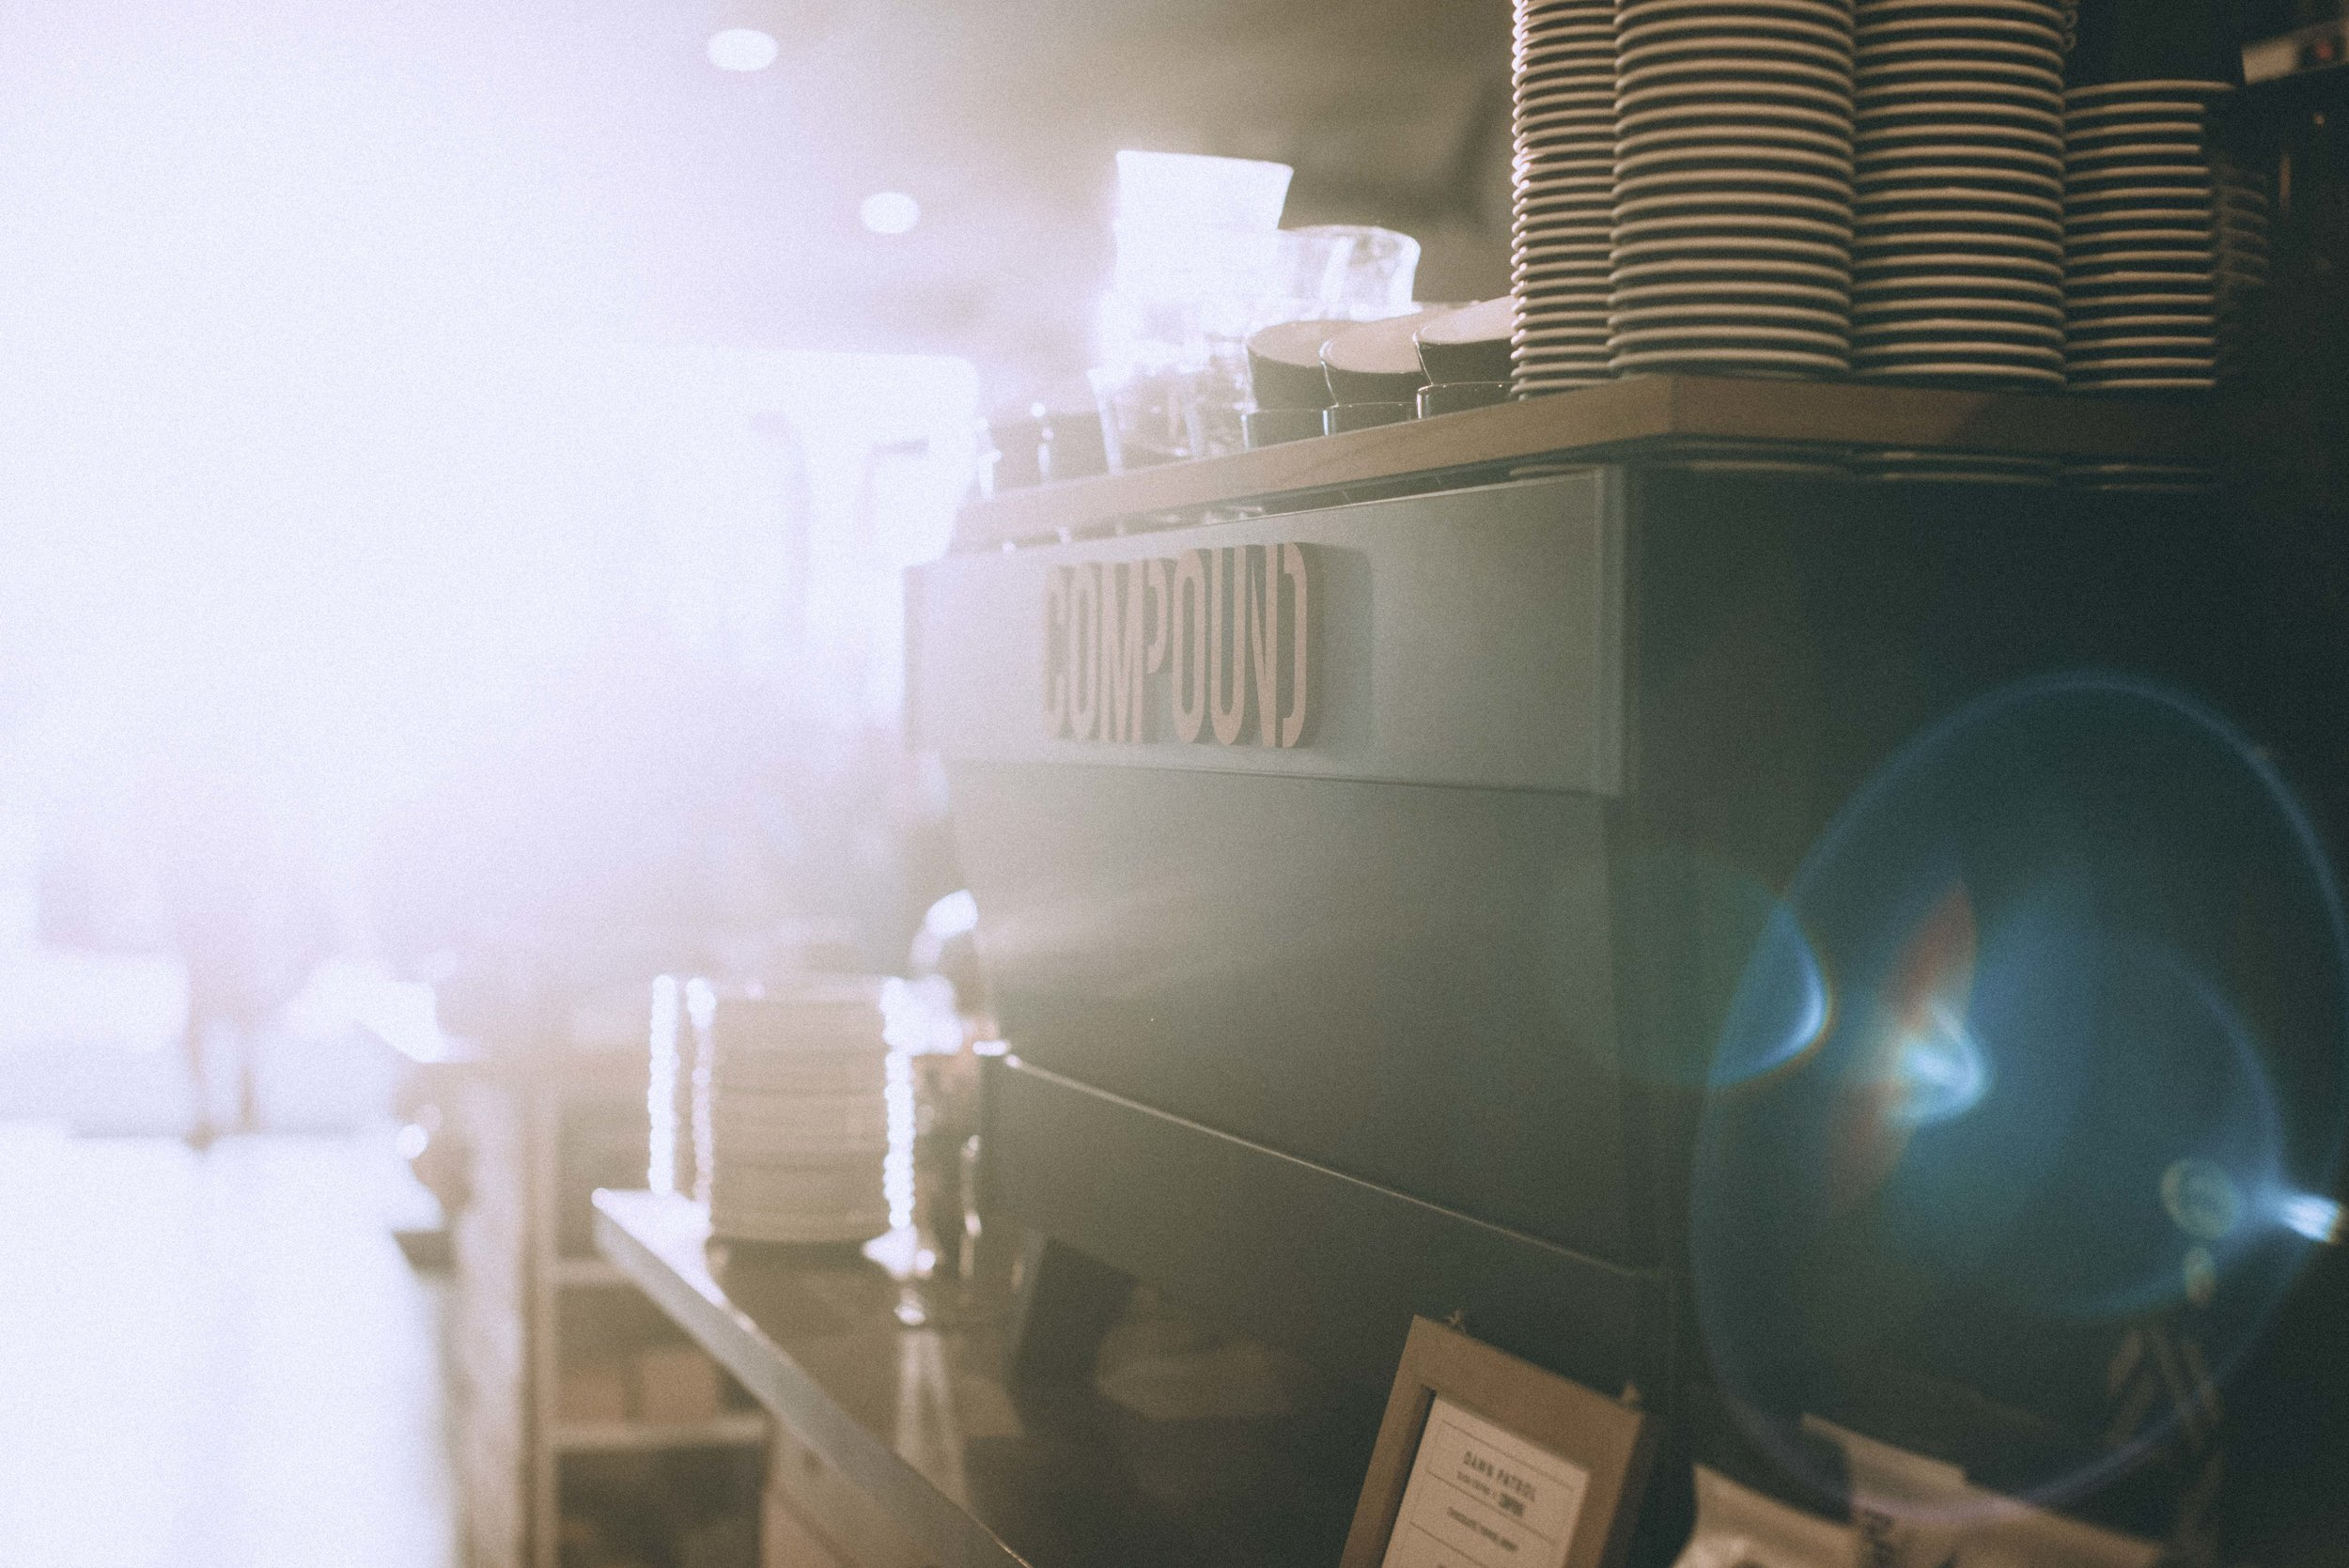 Compound Cafe - Sunshine Coast - Content produced for Compound Surf and Espresso